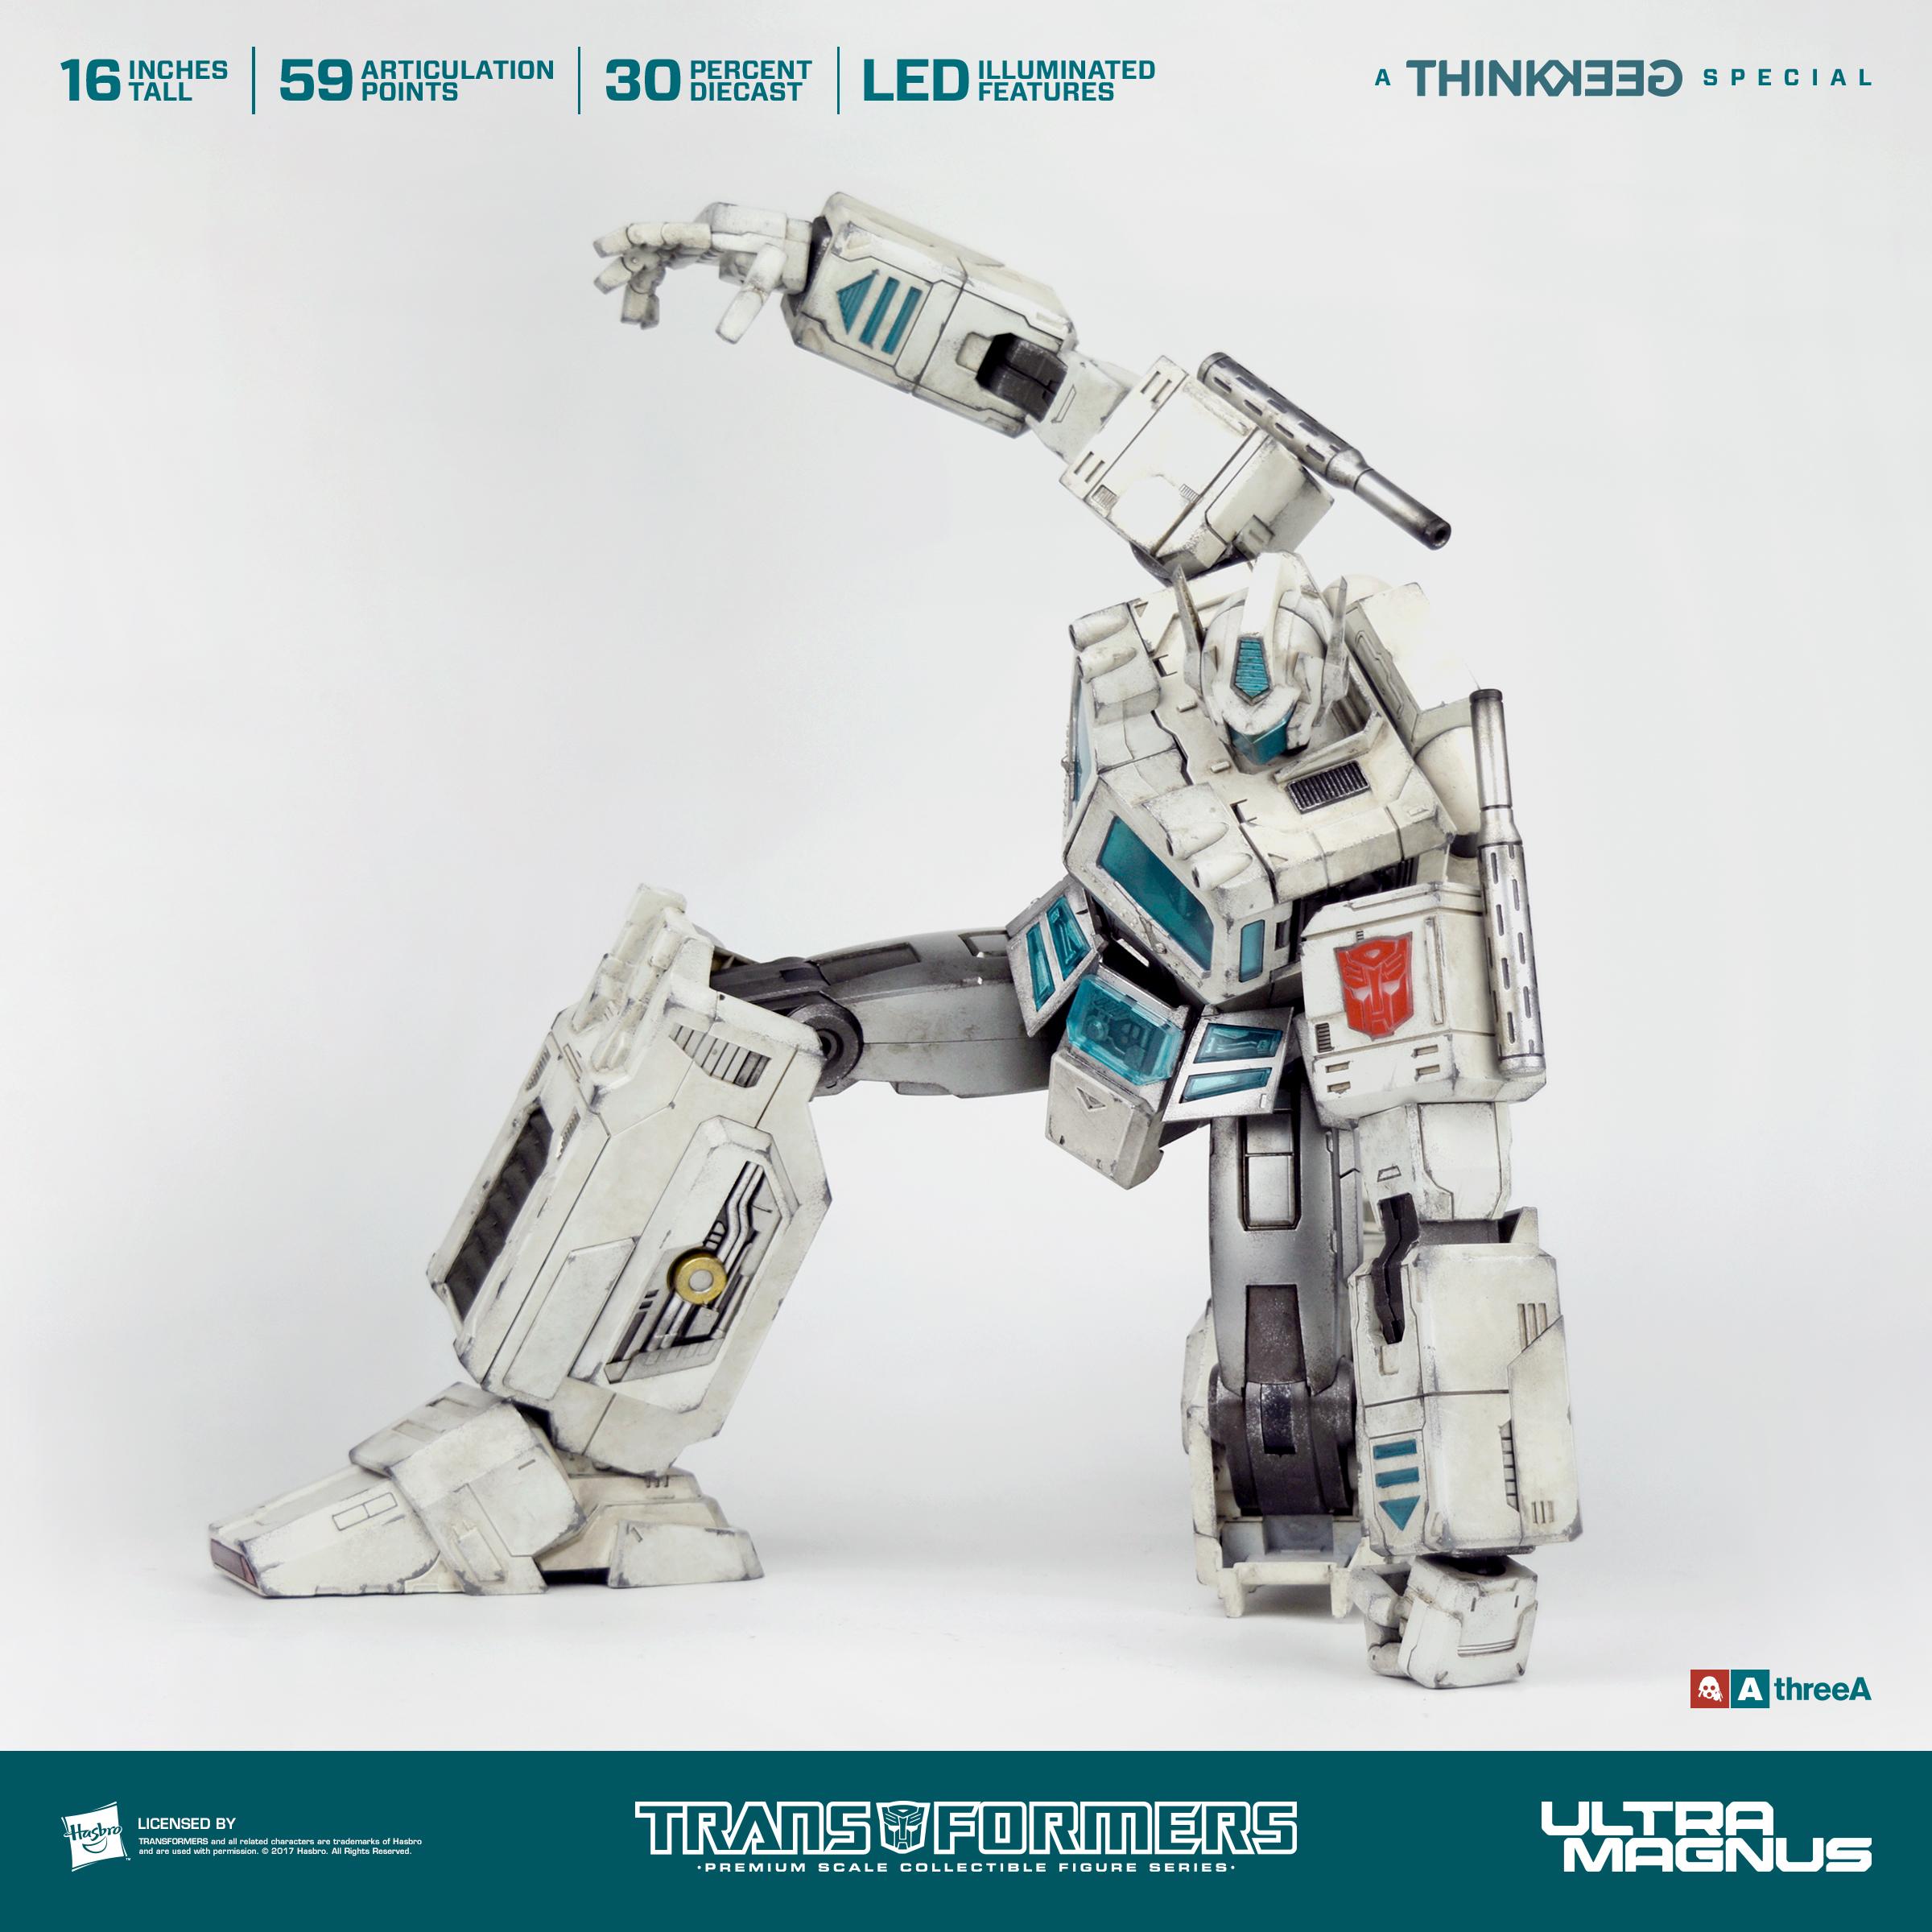 3A_Transformers_G1_UltraMagnus_RetailImages_2400x2400_010.jpg